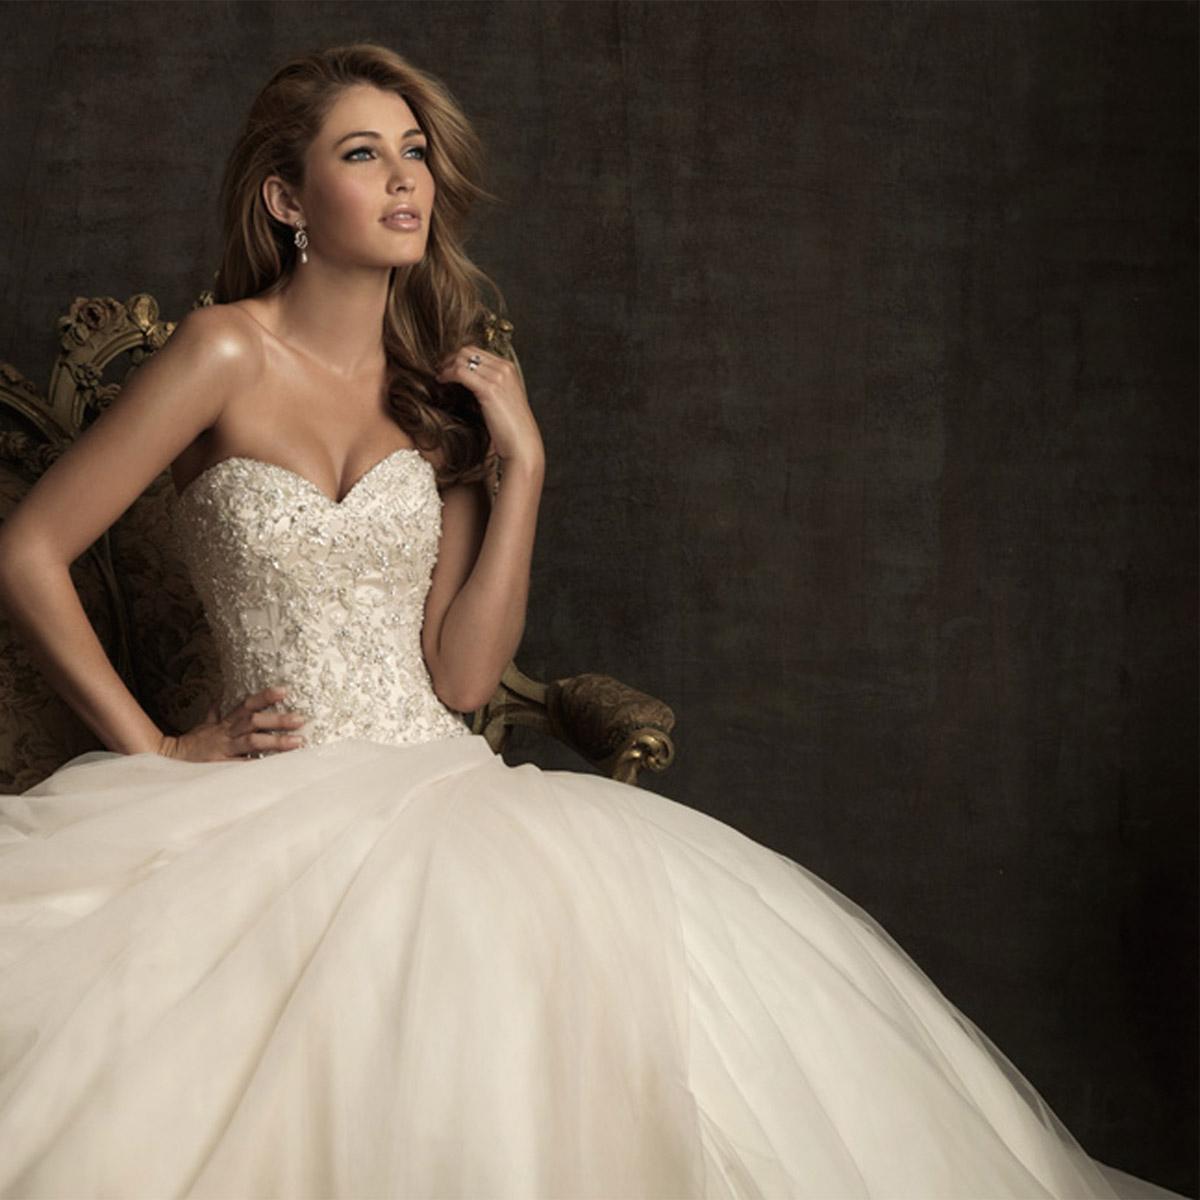 Agape婚纱 新款复古抹胸公主裙撑 手工刺绣抓褶蓬蓬裙